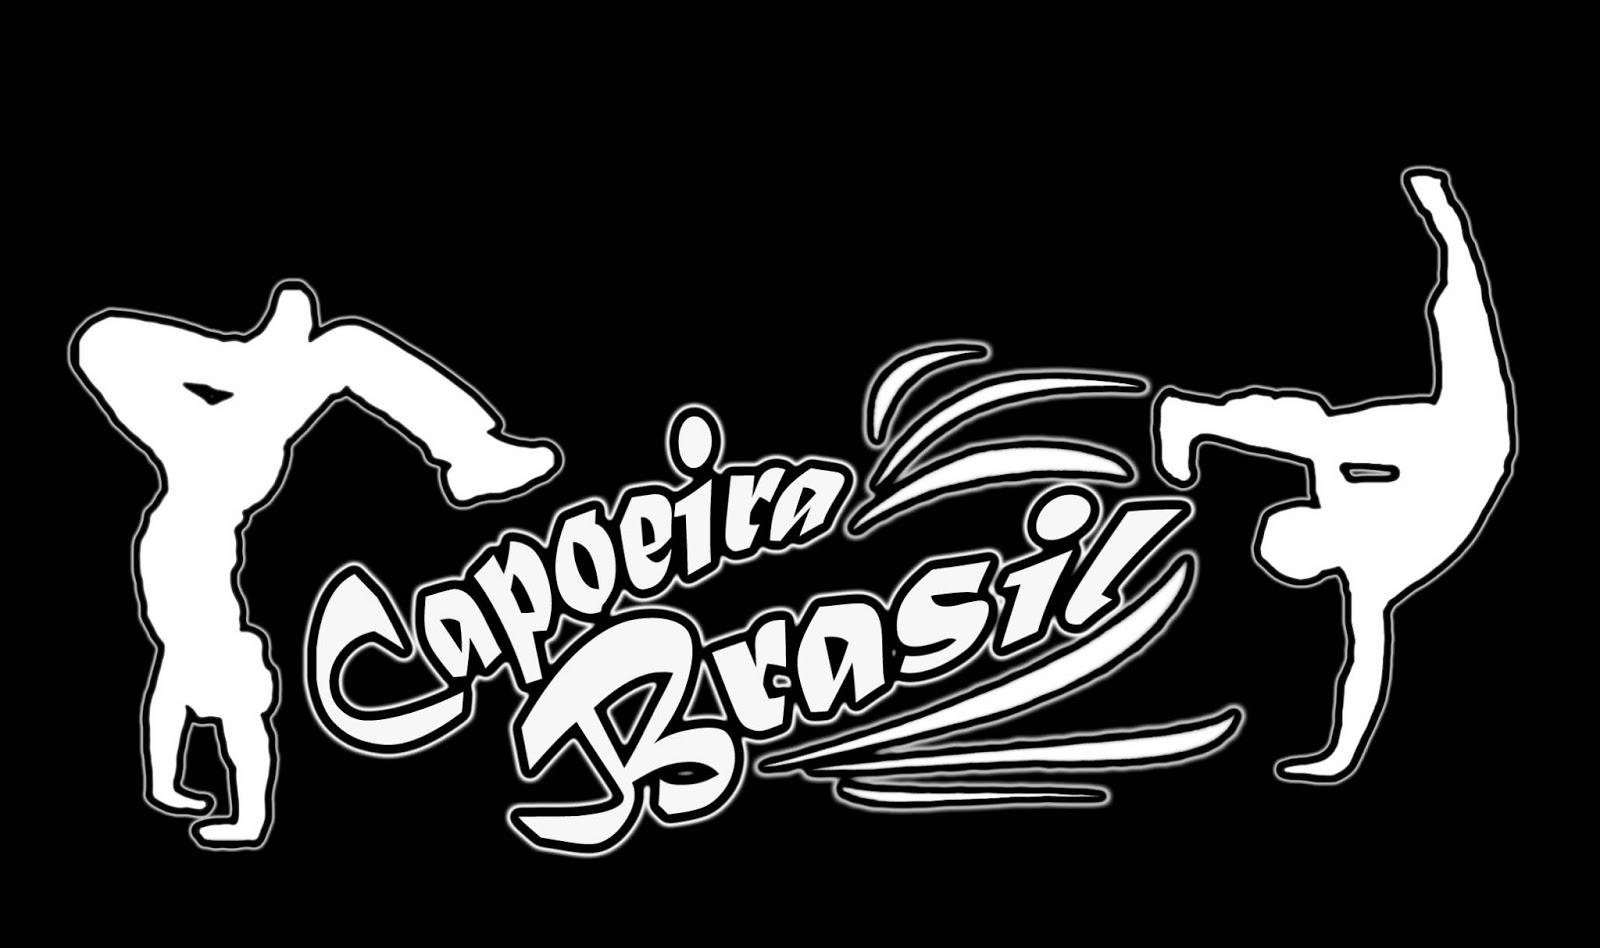 Bhama Hd Wallpaper Capoeira Brazil Wallpapers Screensaver